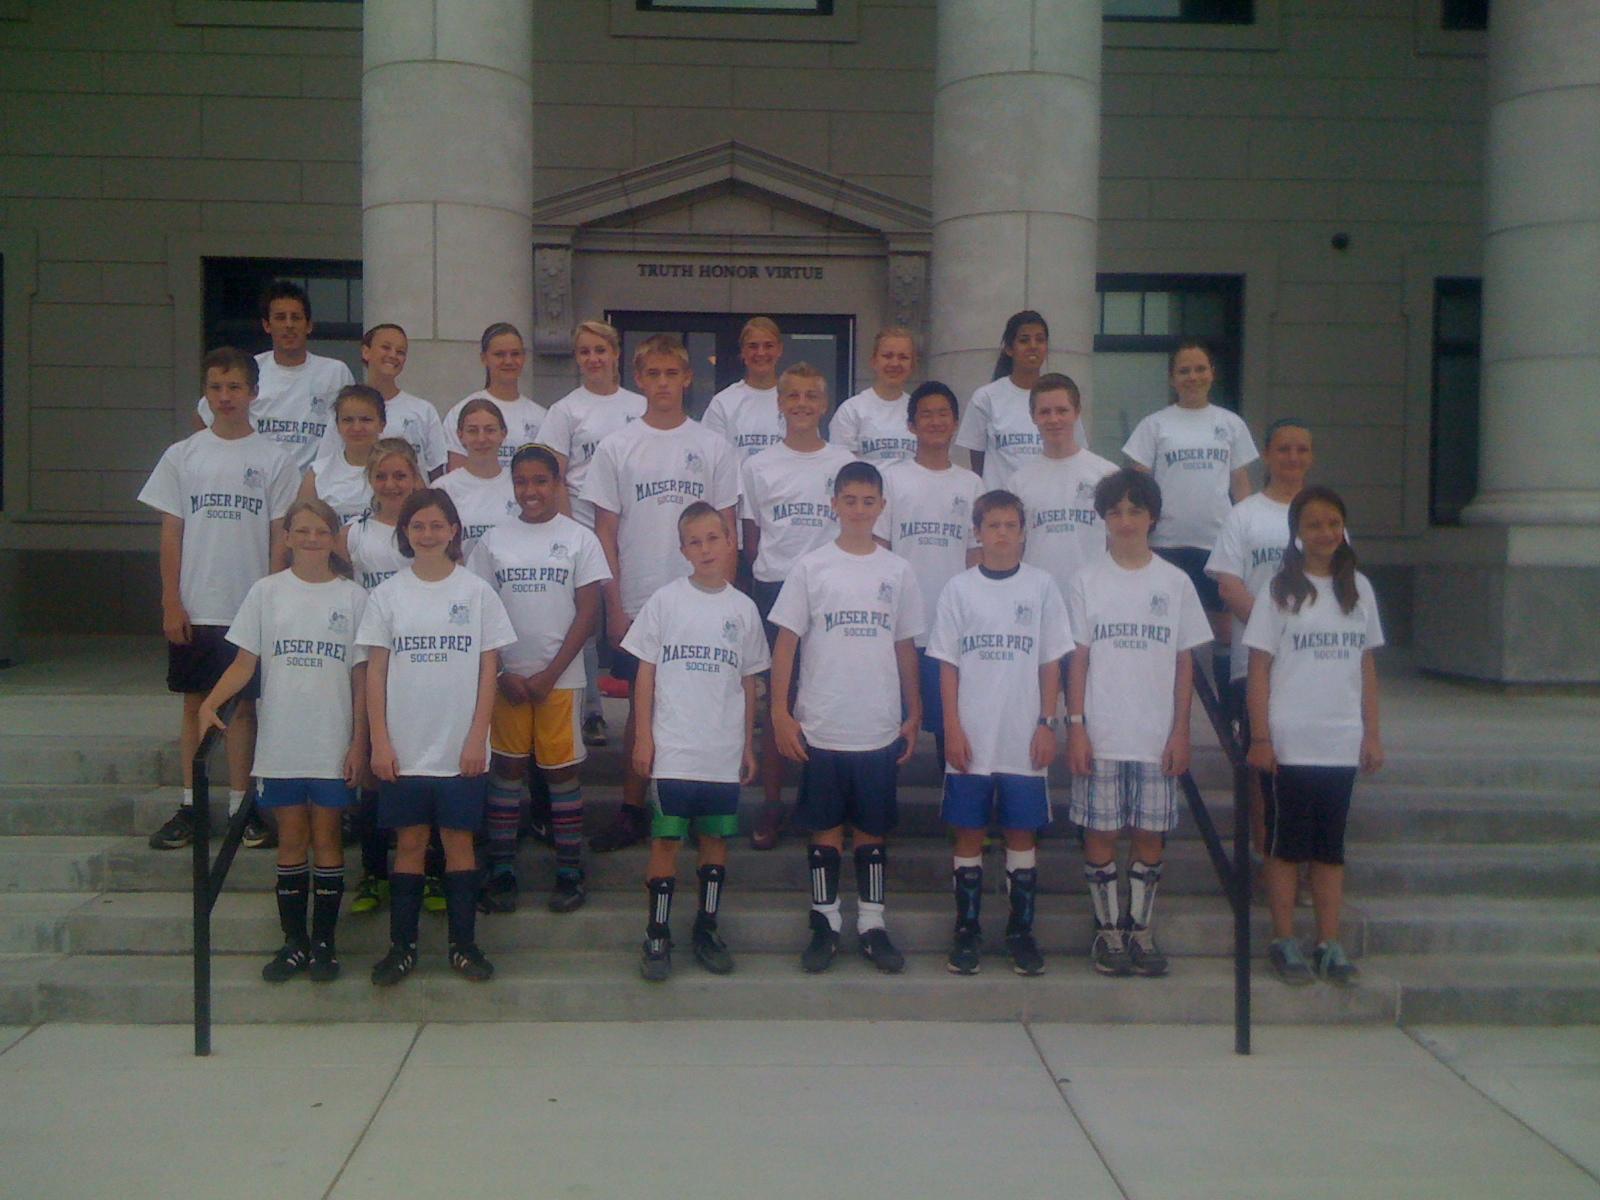 defe233cf Custom T-Shirts for Maeser Prep Soccer Camp - Shirt Design Ideas